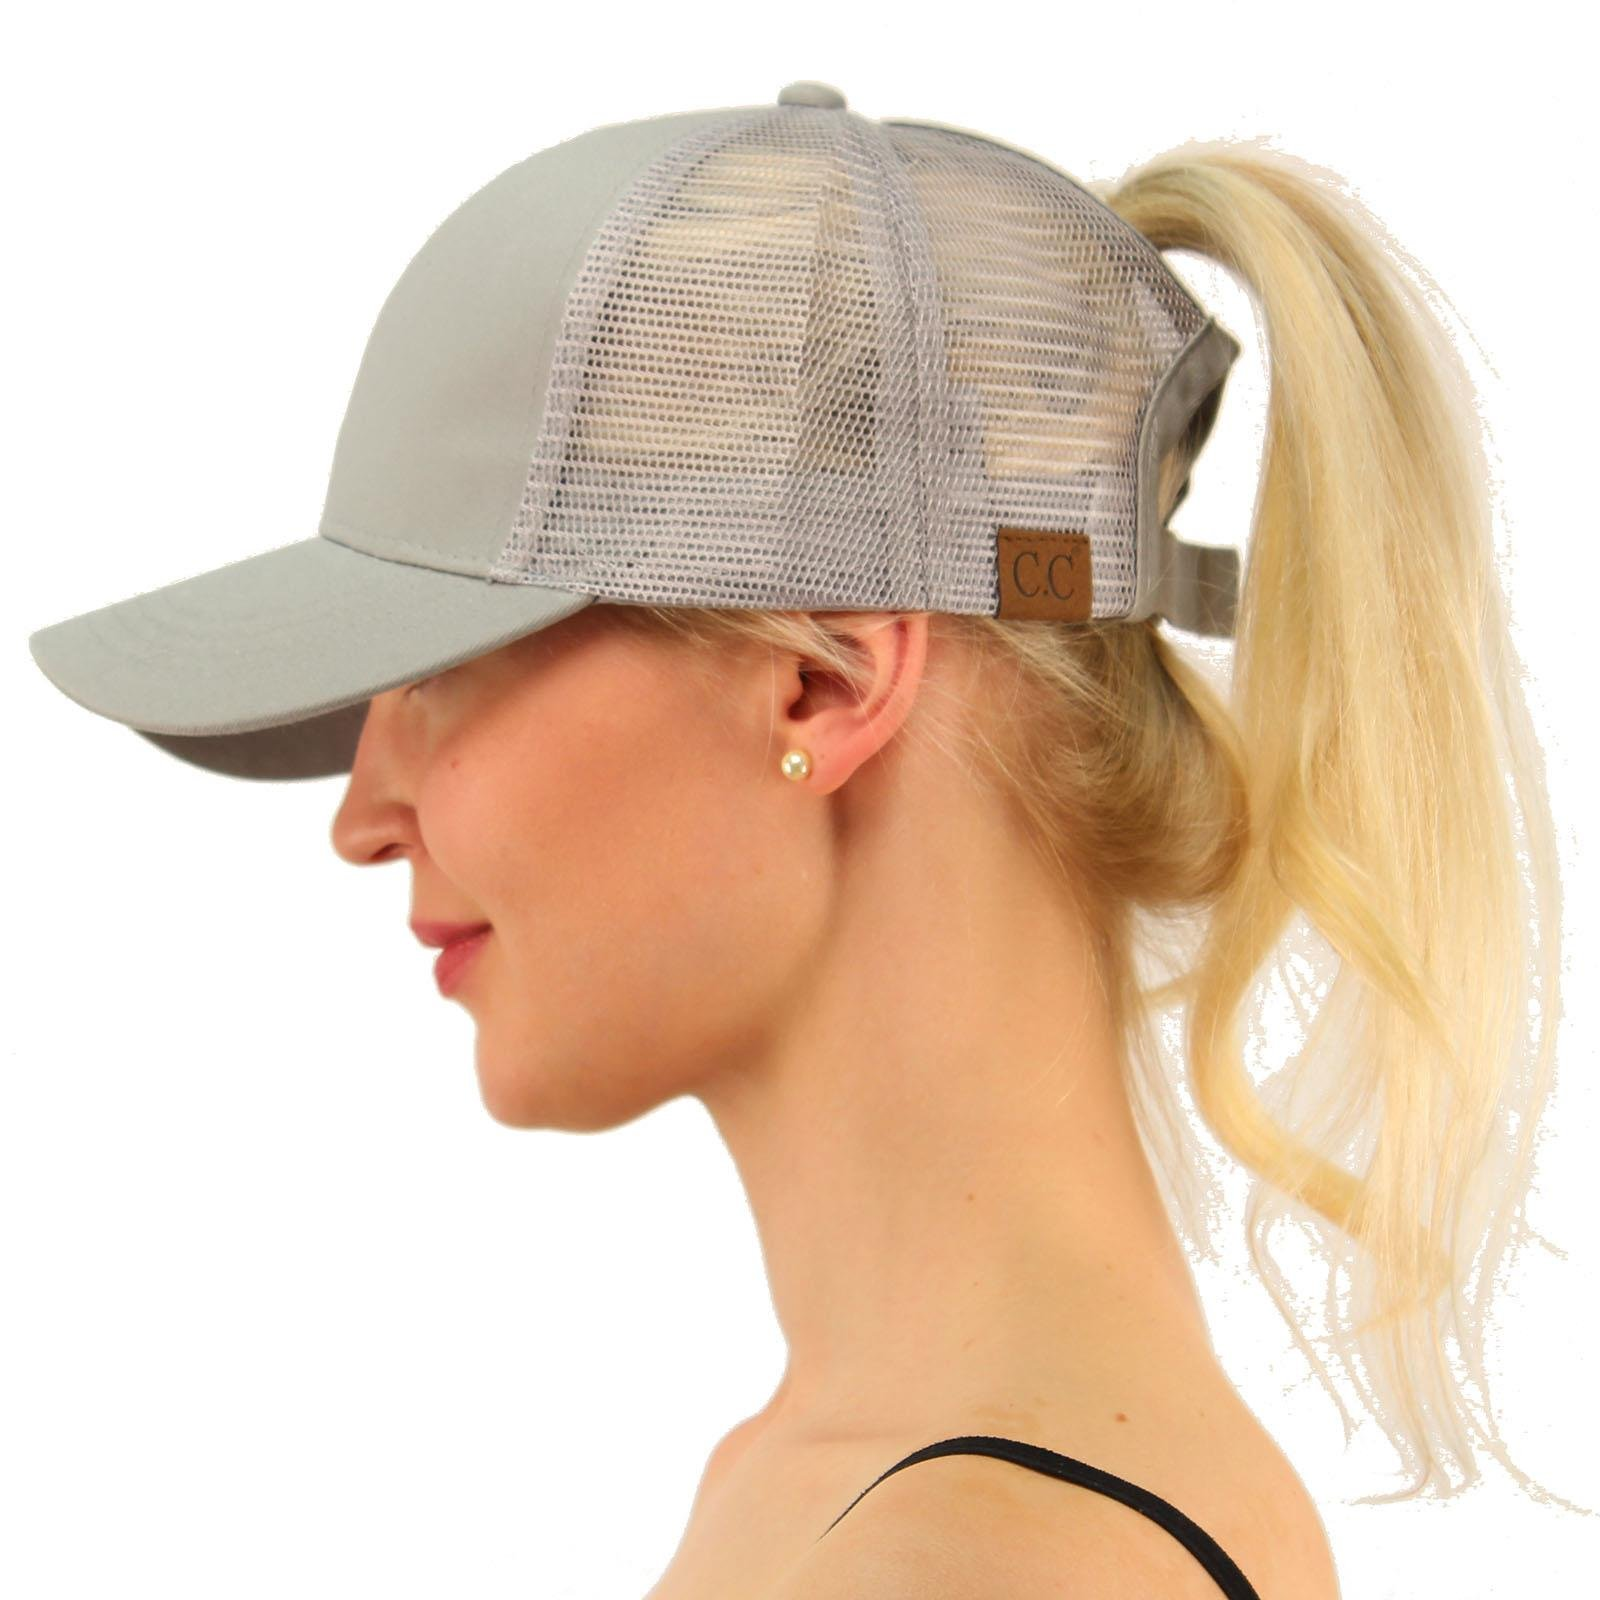 C.C Ponytail Messy Buns Trucker Ponycaps Plain Baseball Visor Cap Dad Hat Gray